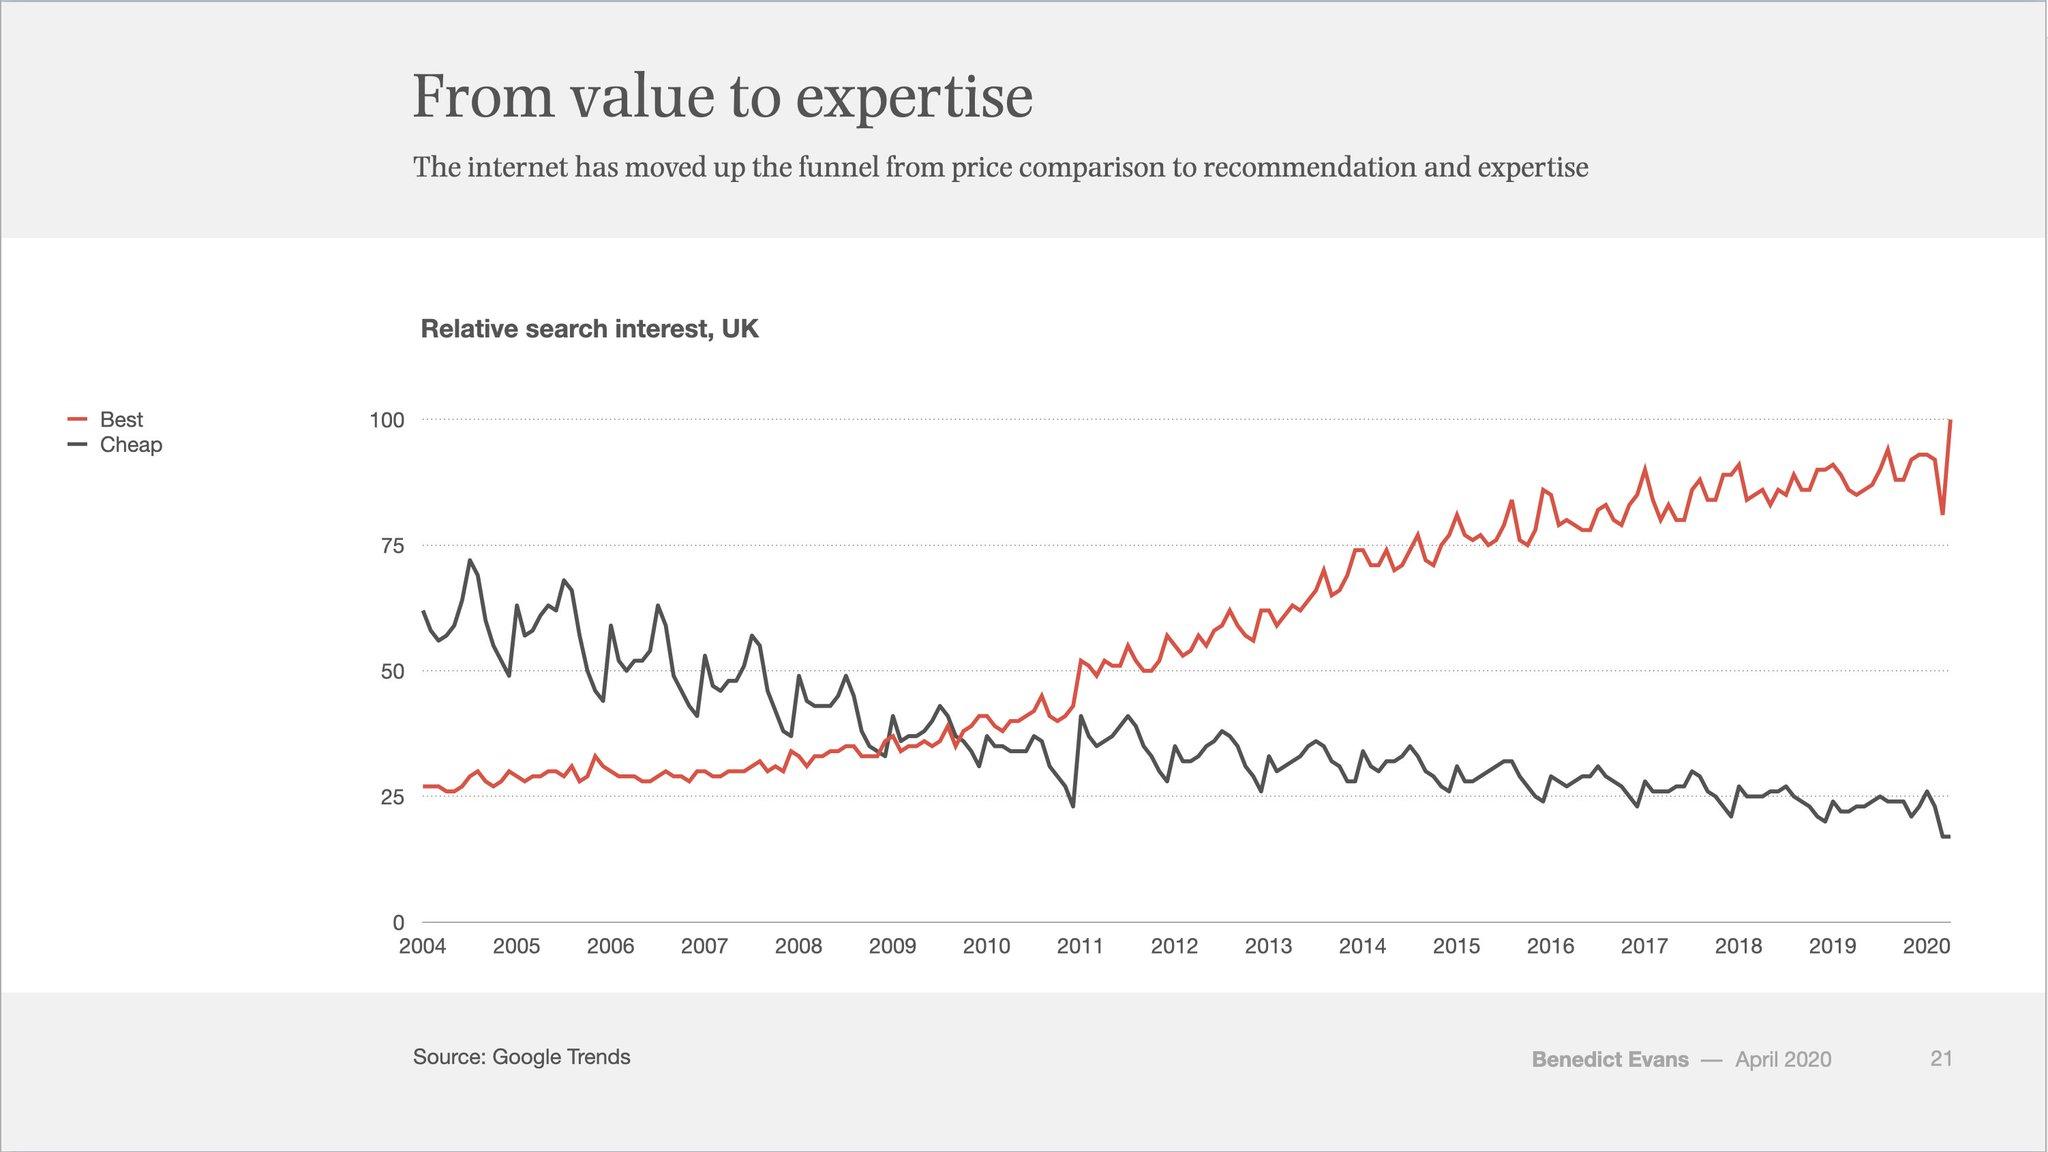 best-vs-cheap-trend